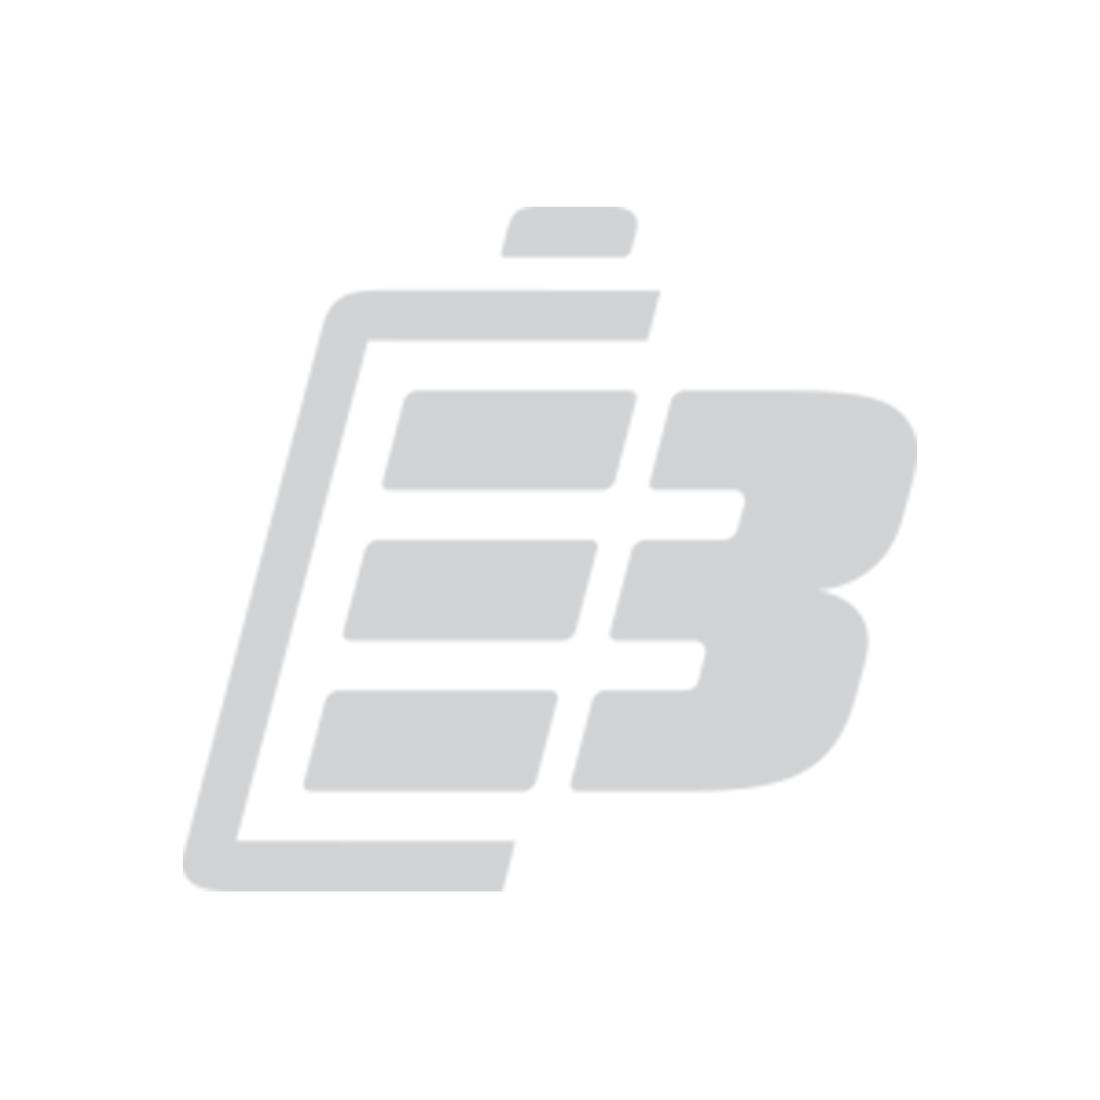 DURACELL-ULTRA-CR123